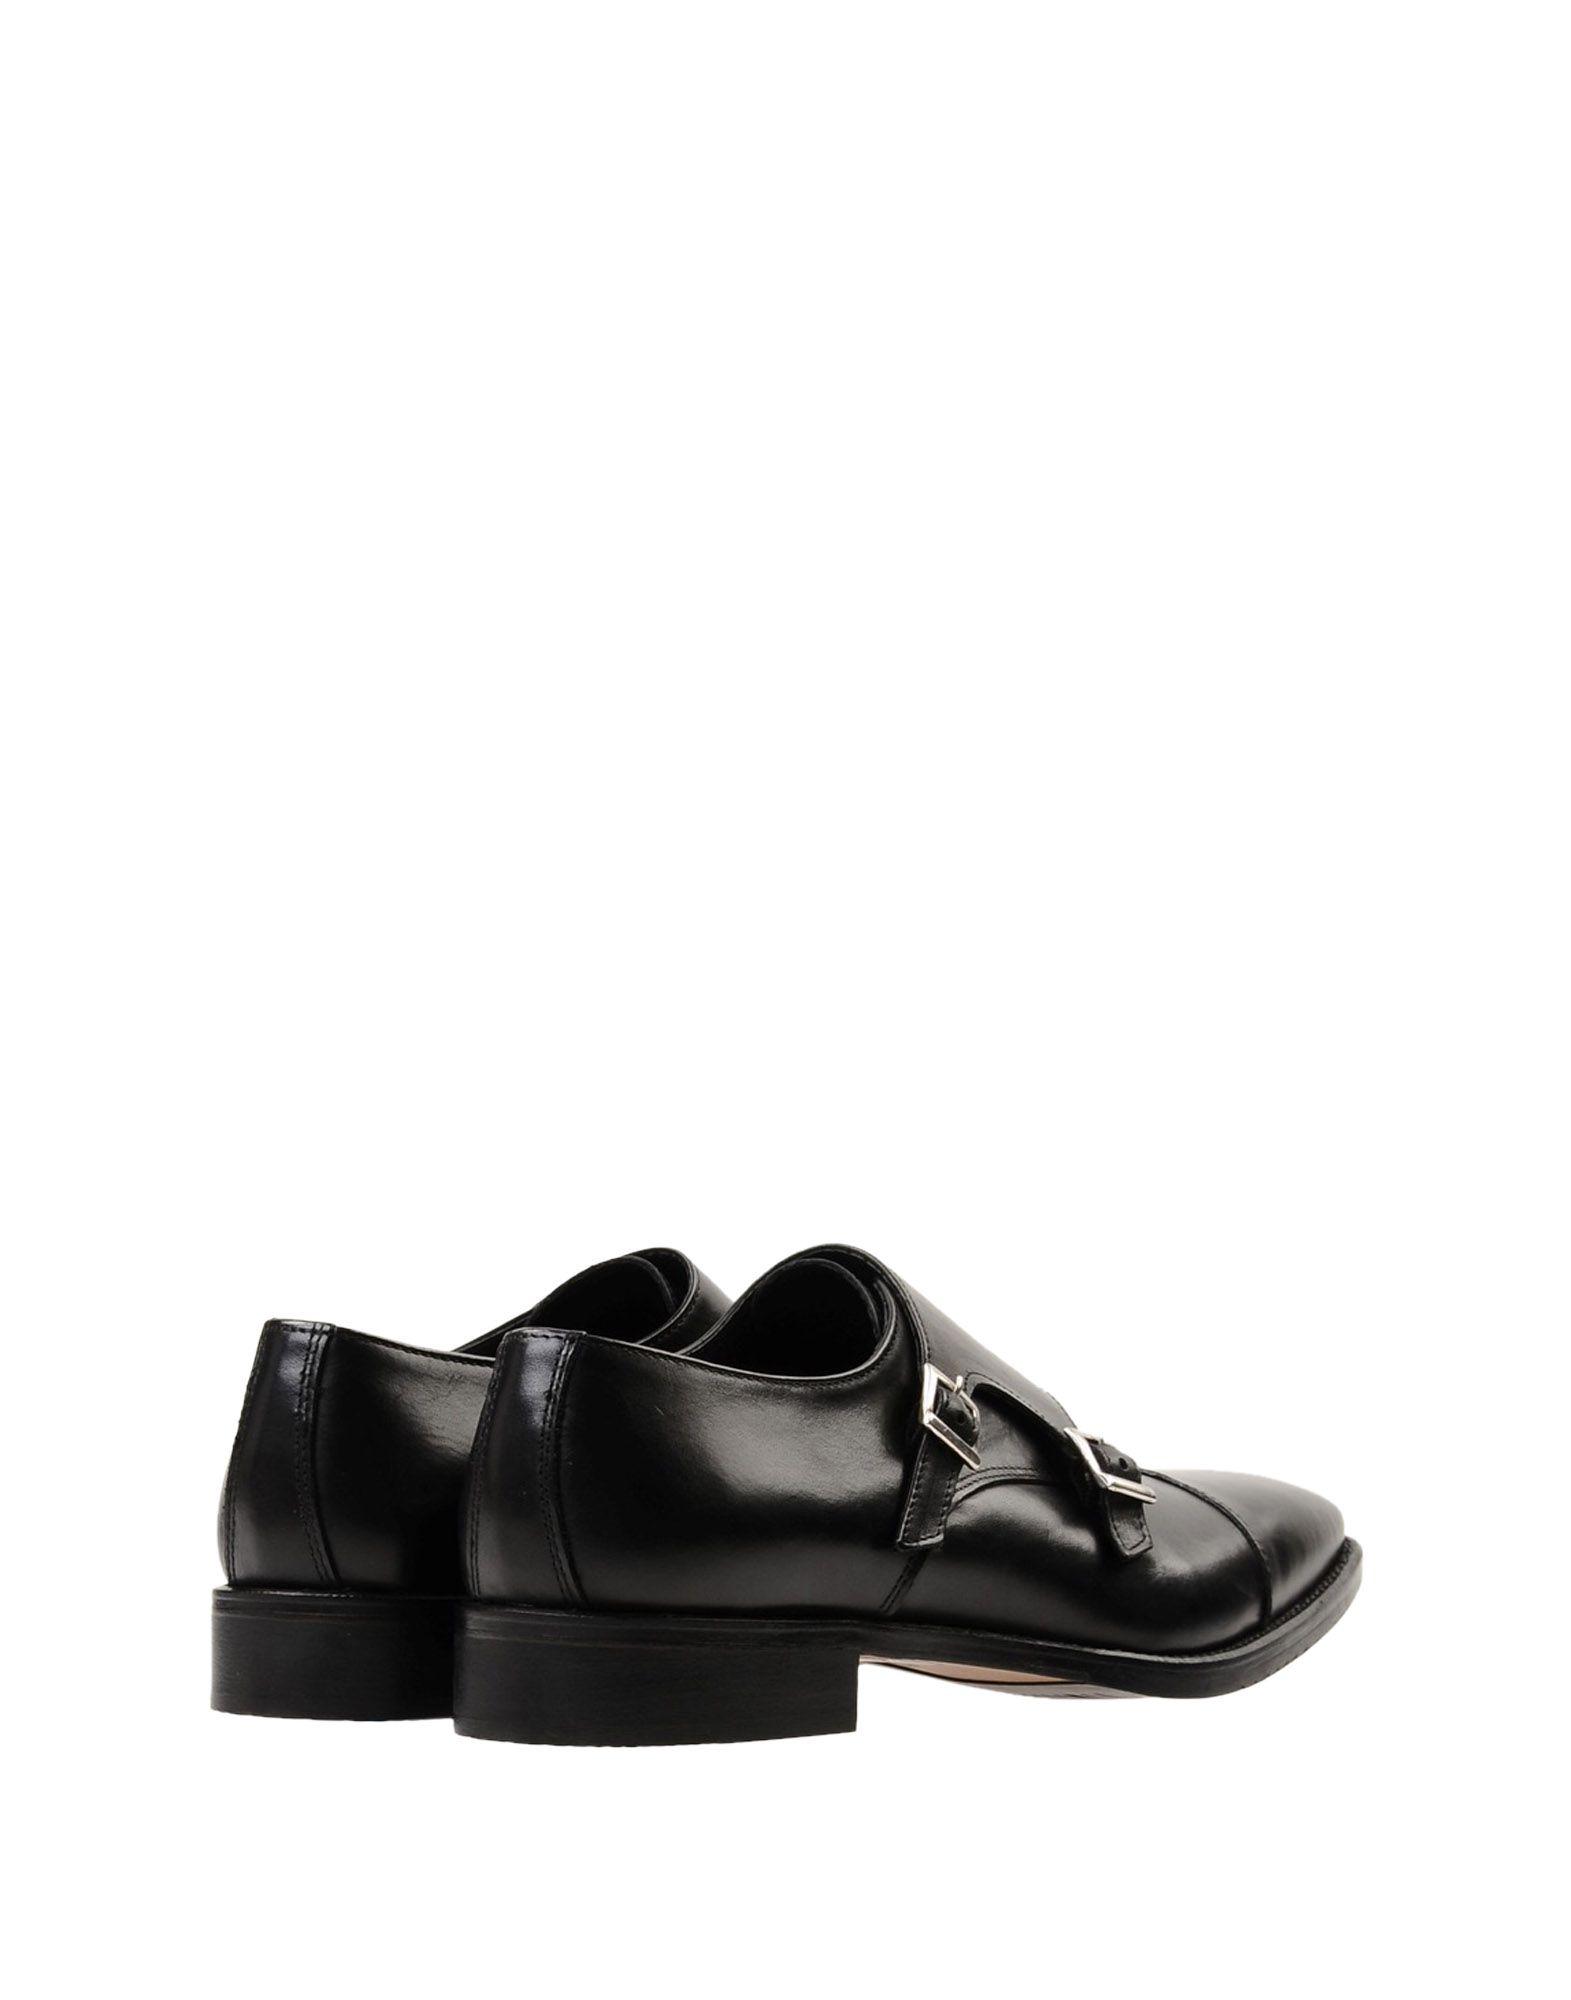 Rabatt echte Schuhe Di 11521481LI Franco Mokassins Herren  11521481LI Di 07f7f7